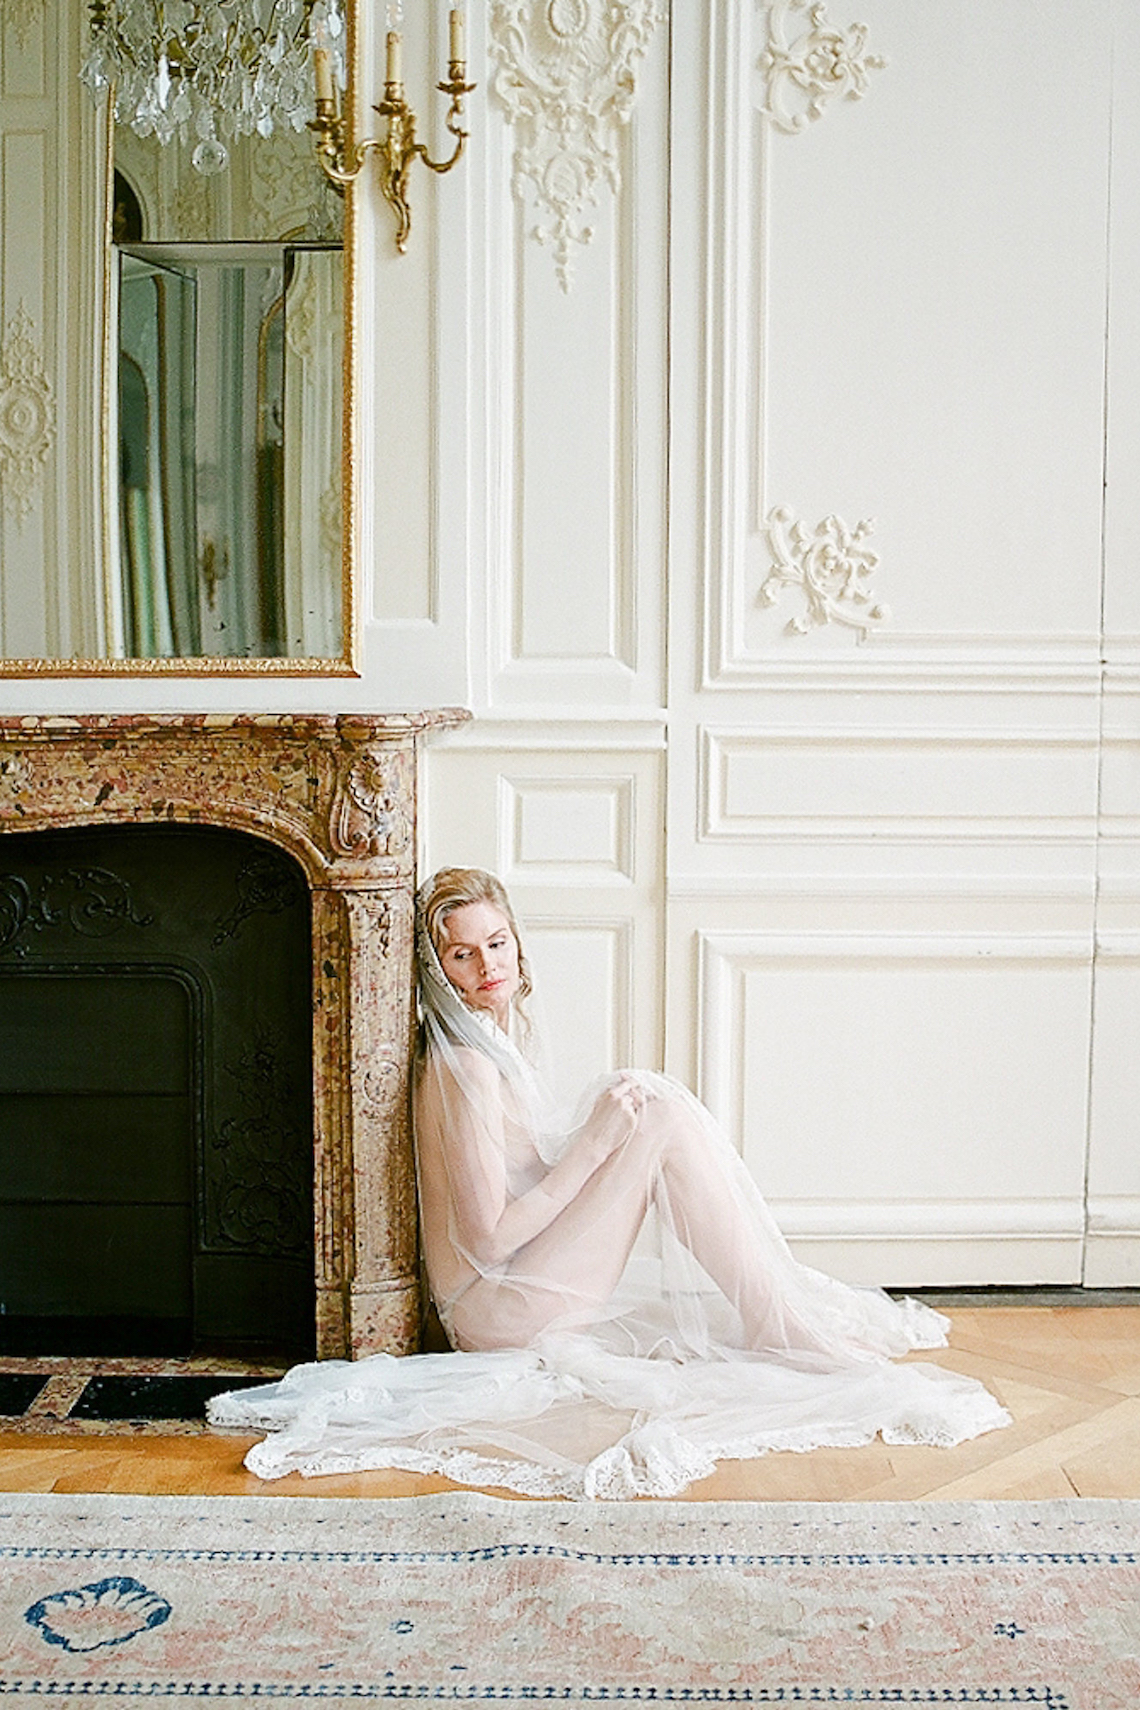 Elegant Blush Parisian Bridal Inspiration Featuring Luxurious Veils and Boudoir Ideas – Bonphotoge 44